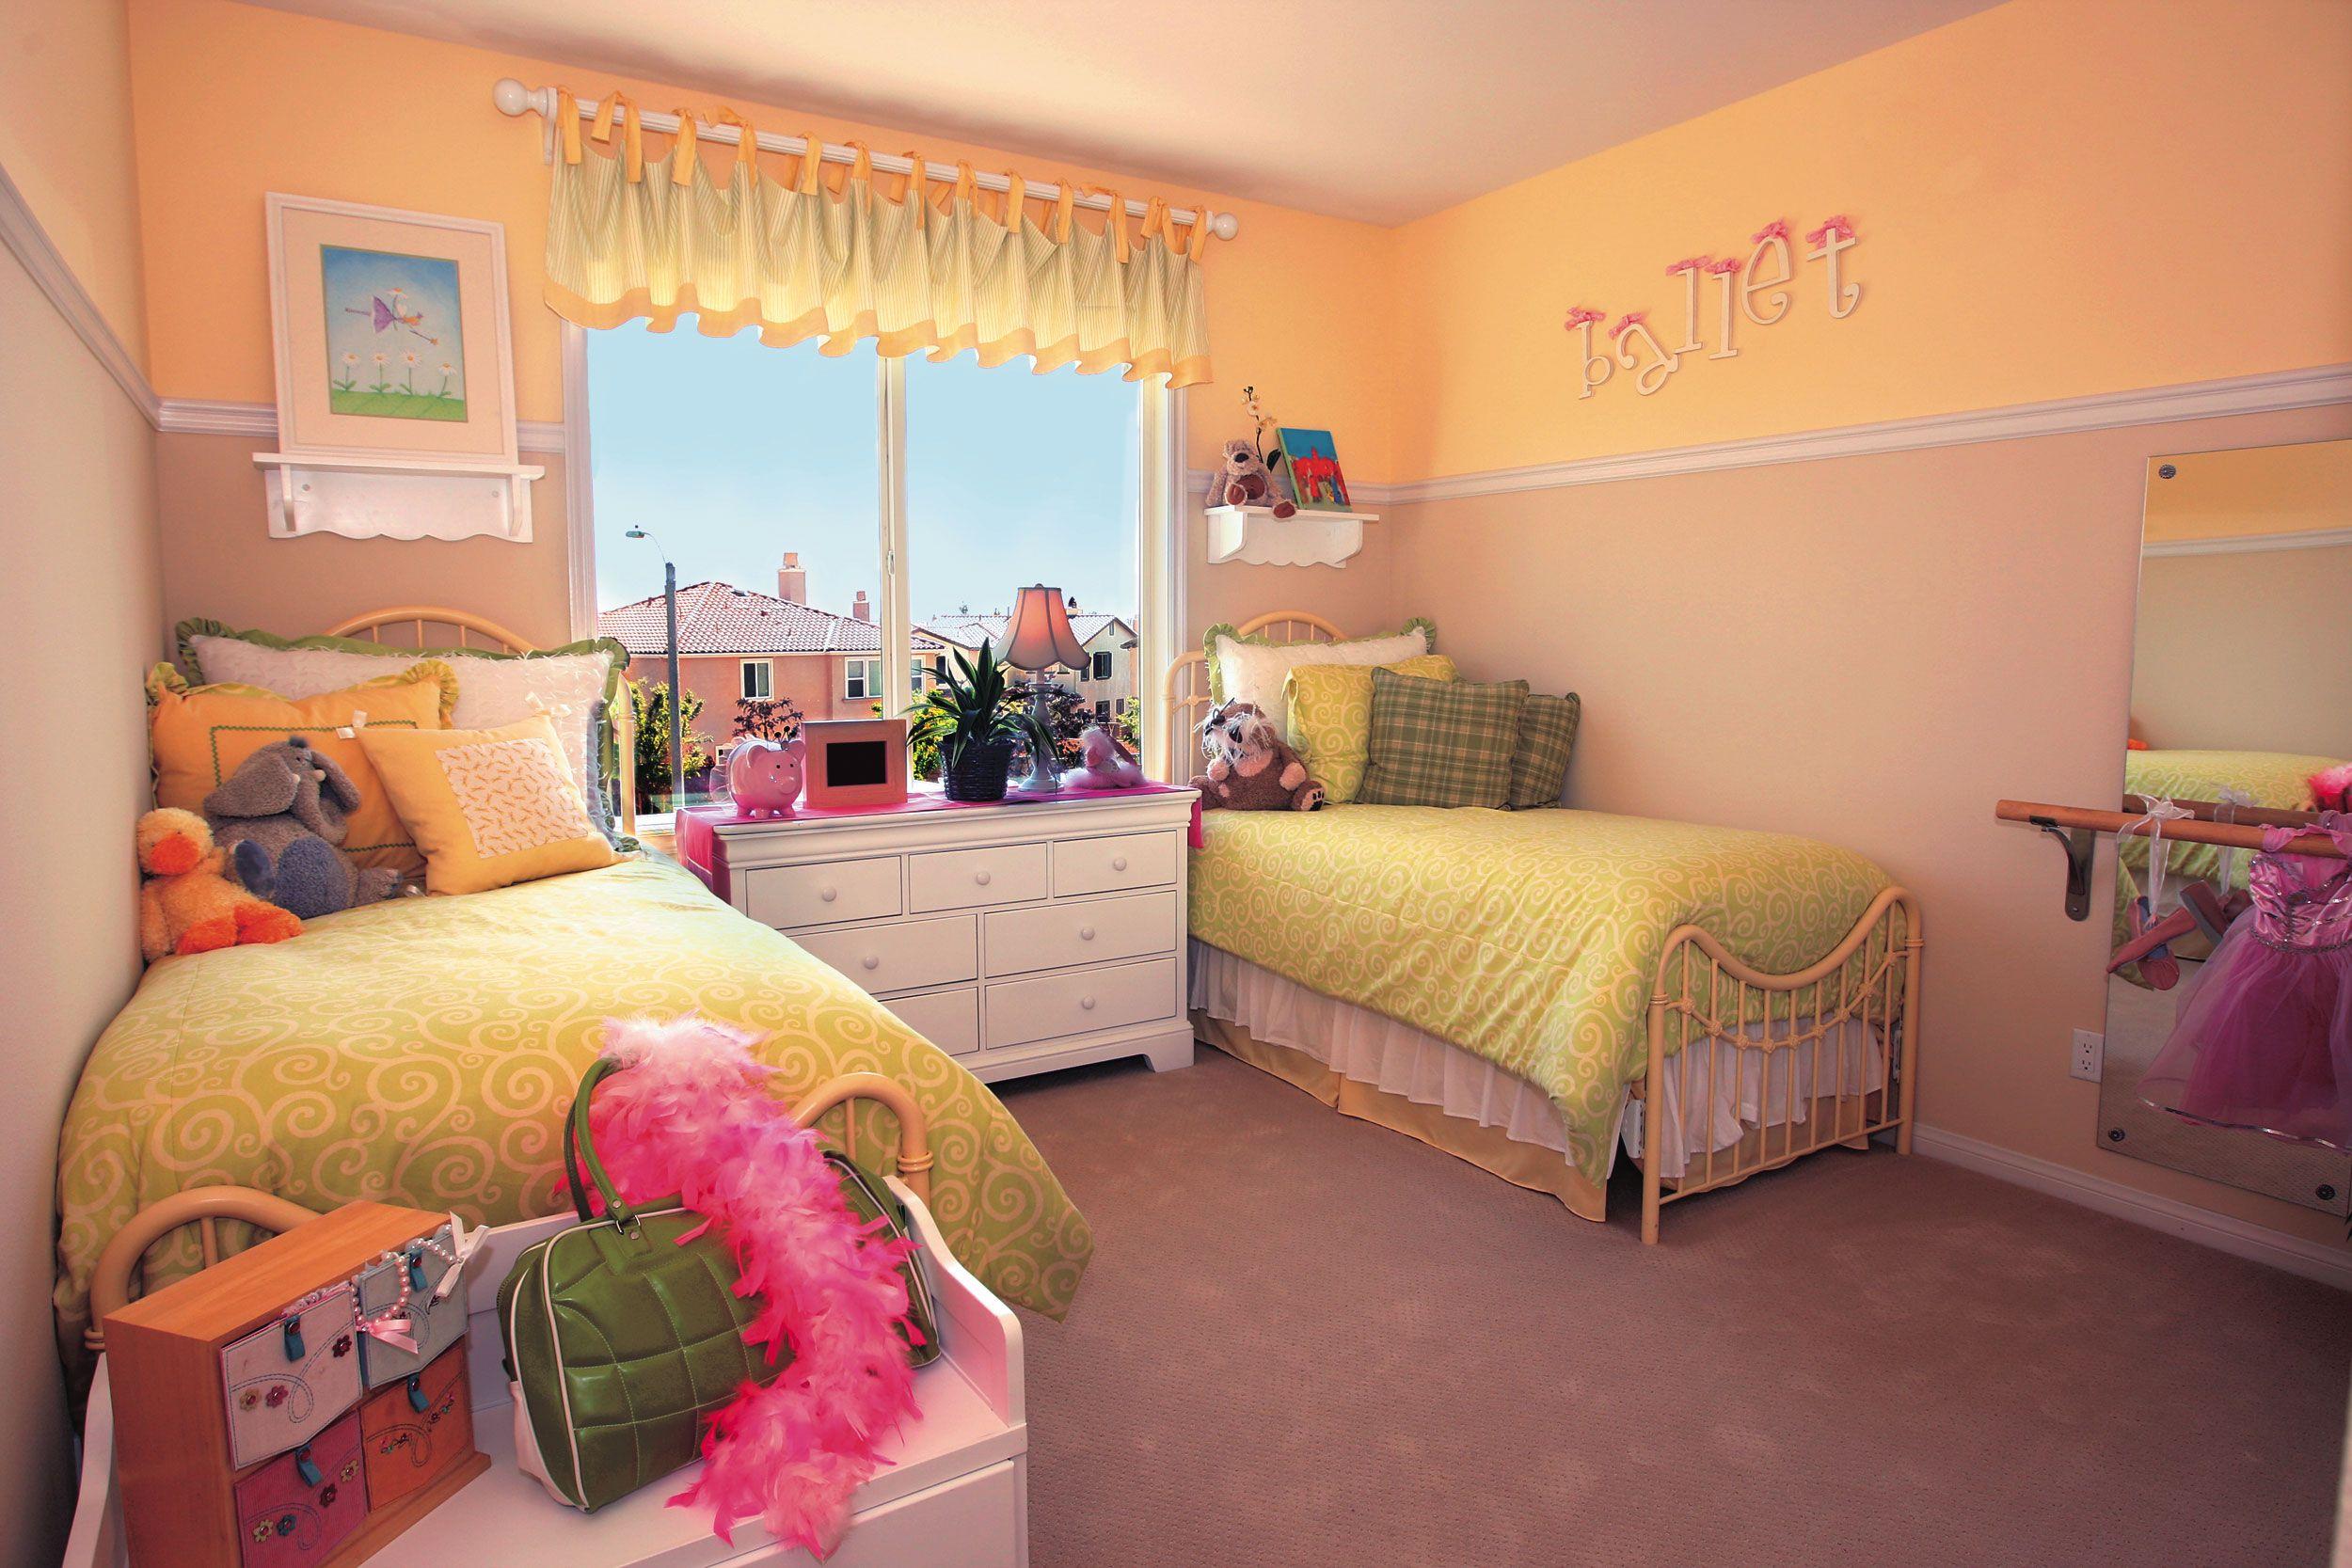 1000 images about Children 39 s bed room on Pinterest. Child Bedroom